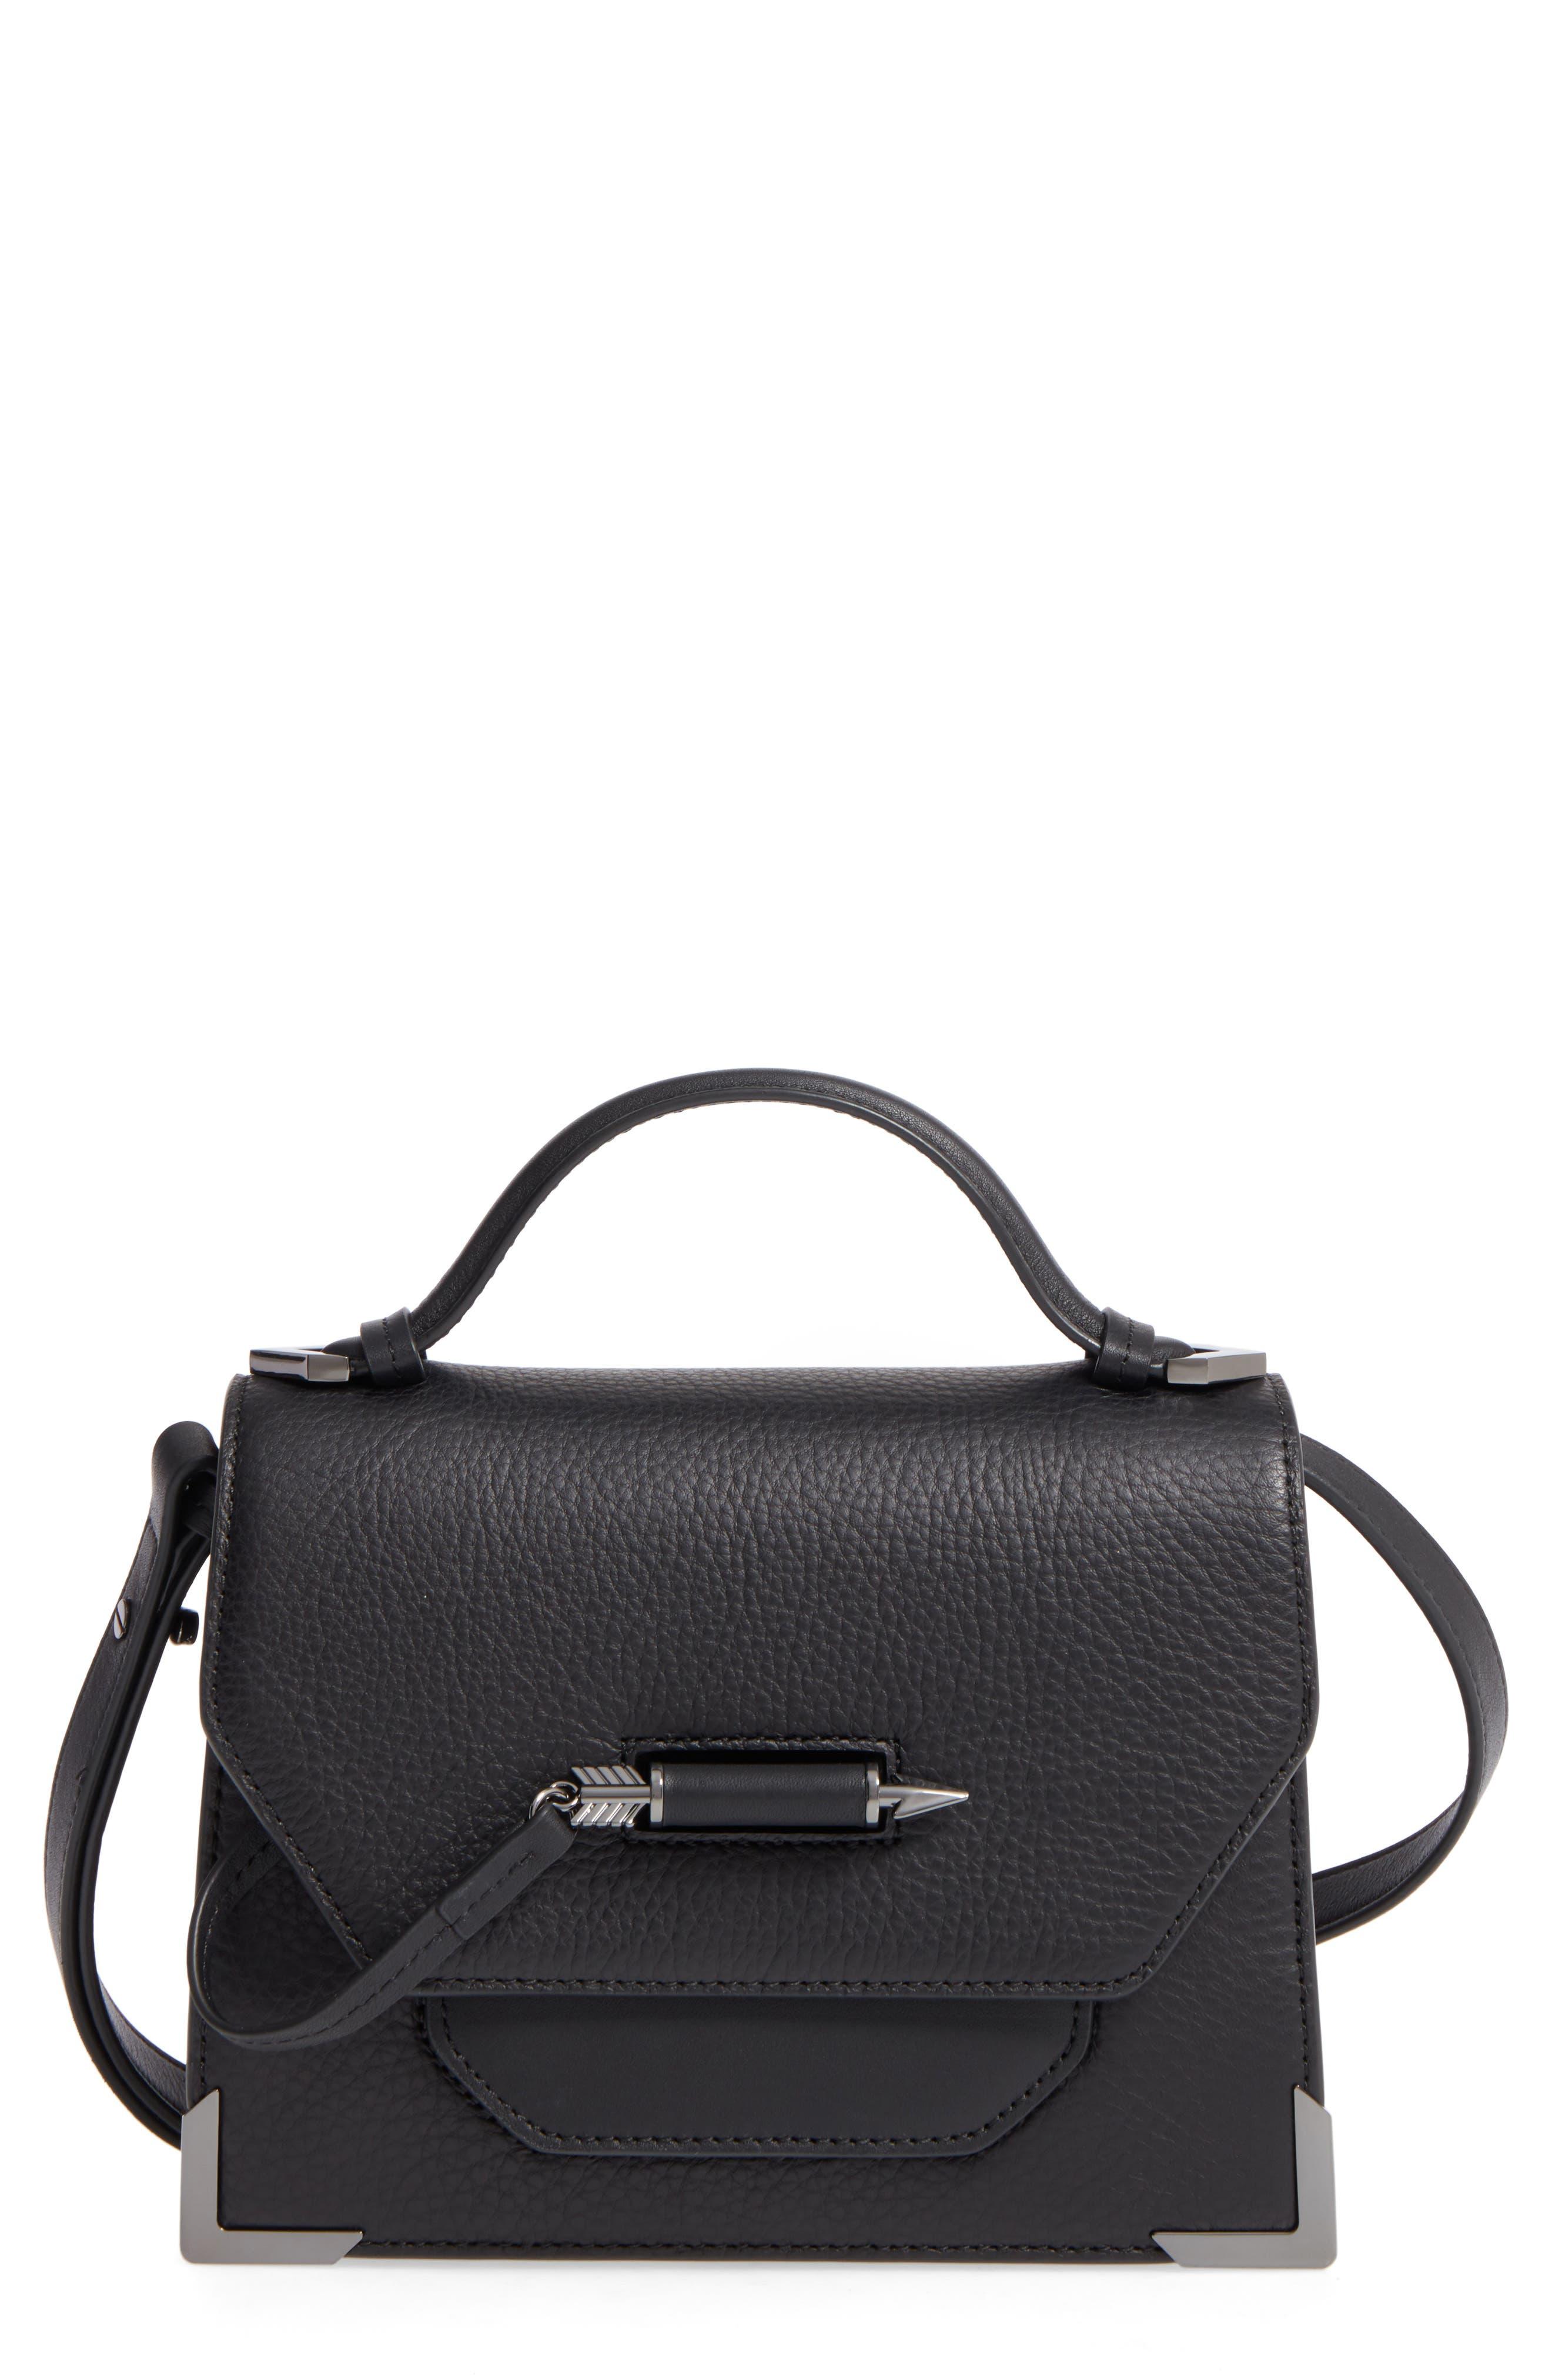 Keeley Leather Satchel,                         Main,                         color, BLACK